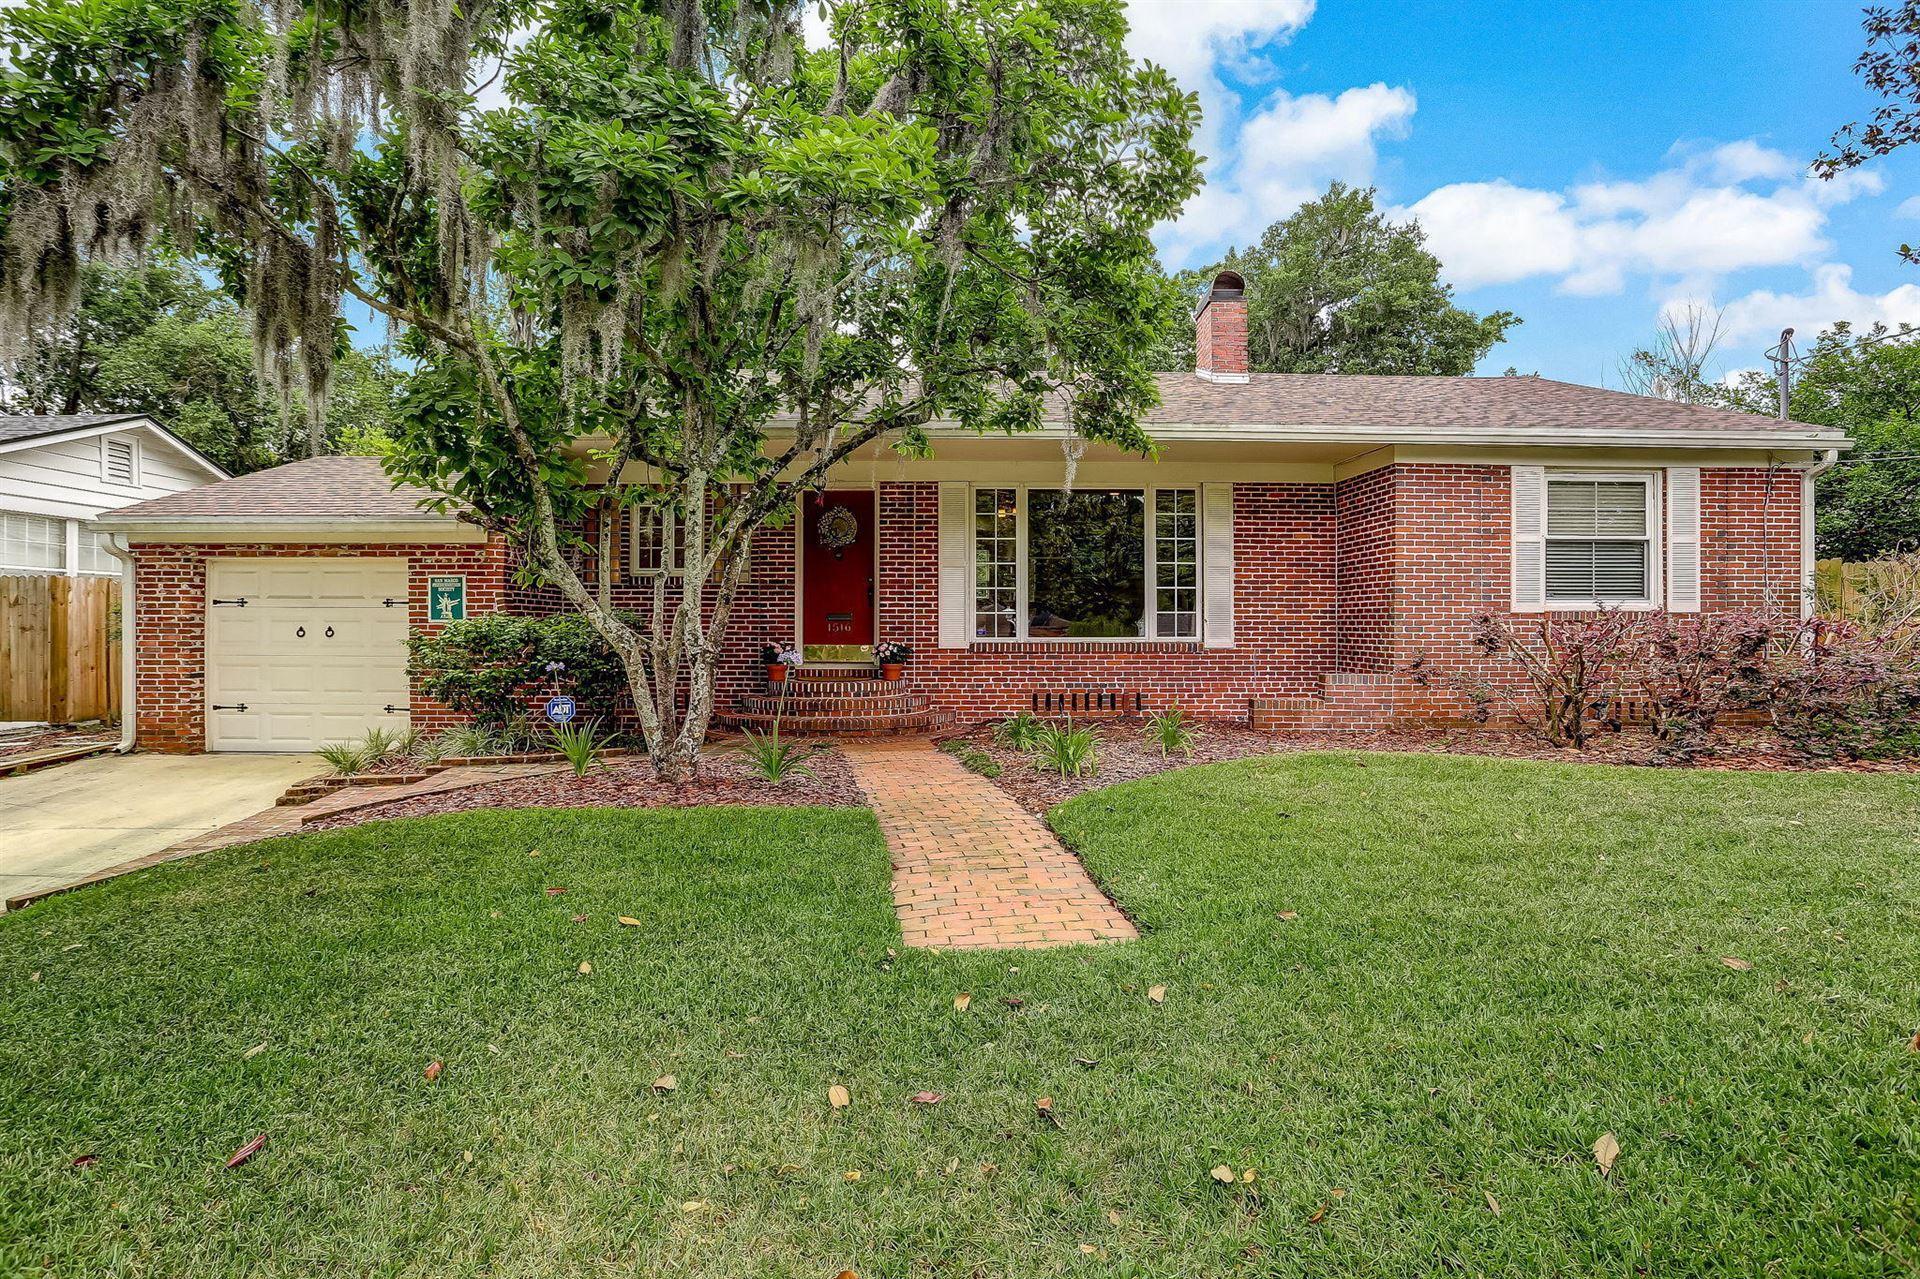 1516 LORIMIER RD, Jacksonville, FL 32207 - MLS#: 1109832